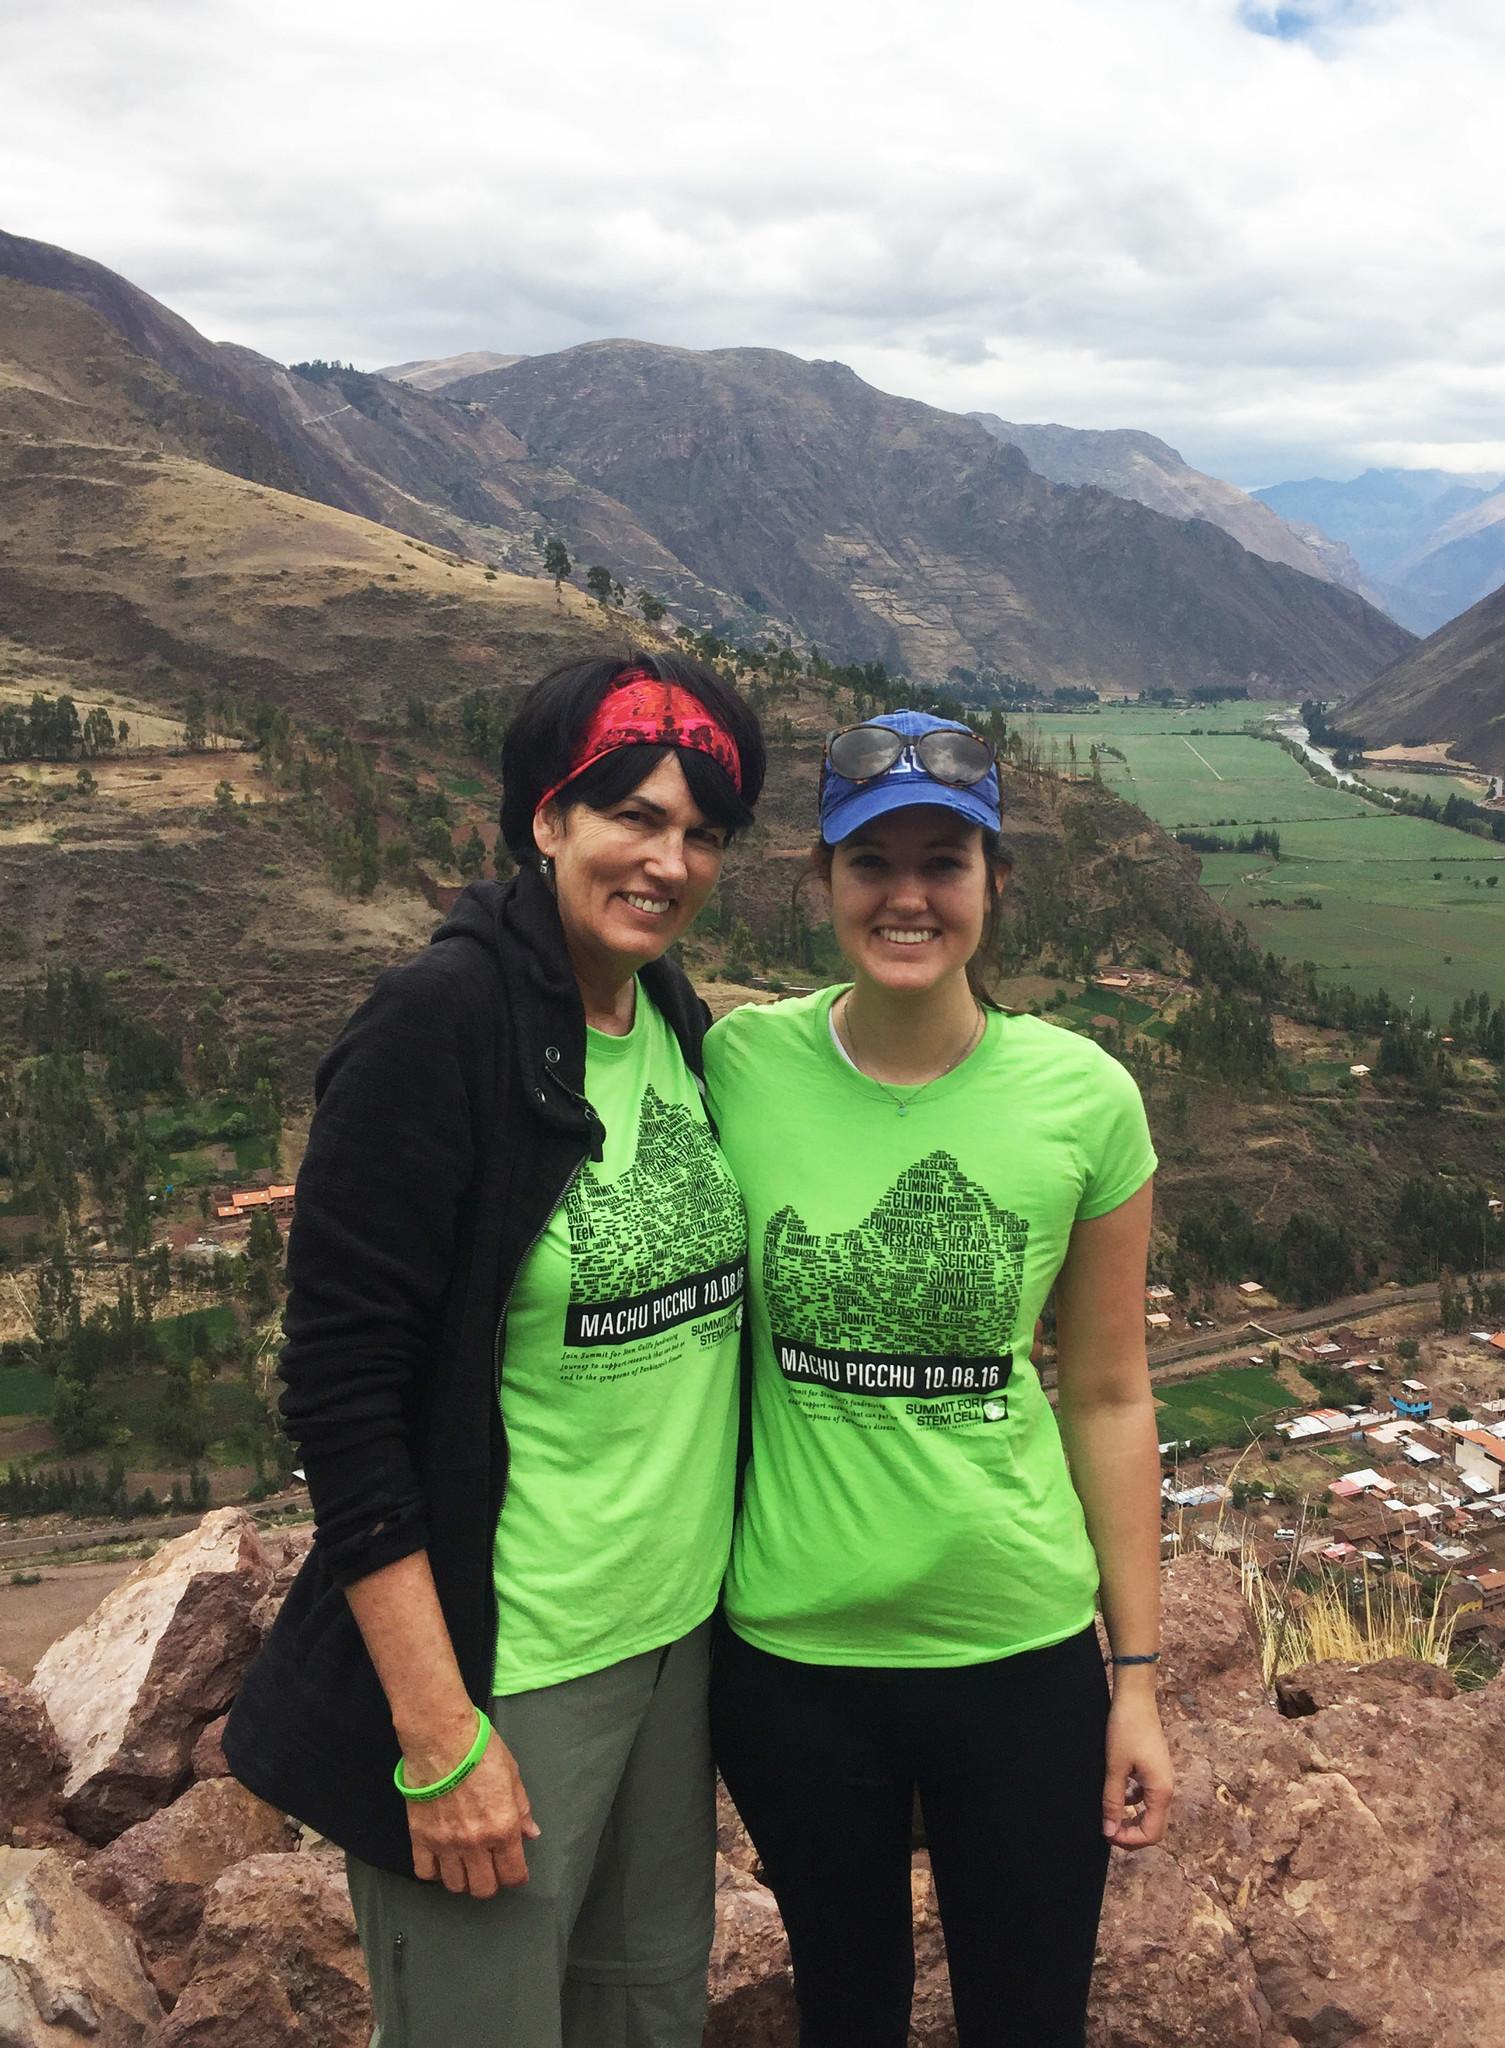 Elena and Tess Andrews, hiking the trail to Machu Picchu in Peru.